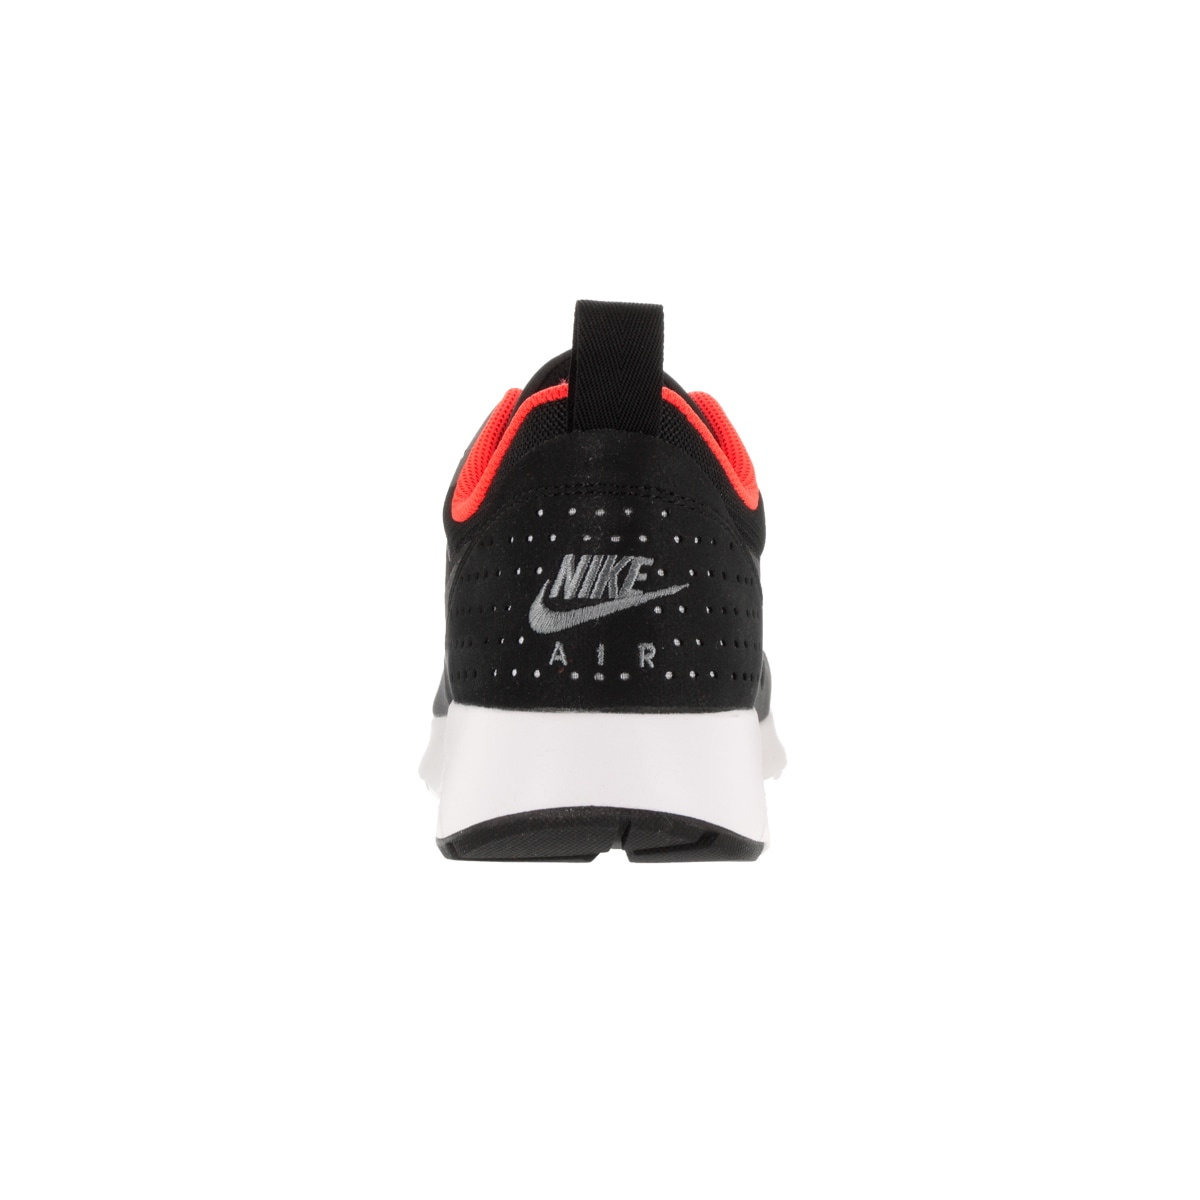 6a8e0c54b547 Shop Nike Men s Air Max Tavas Black Dark Grey Total Crimson White Running  Shoe - Free Shipping Today - Overstock - 12329310